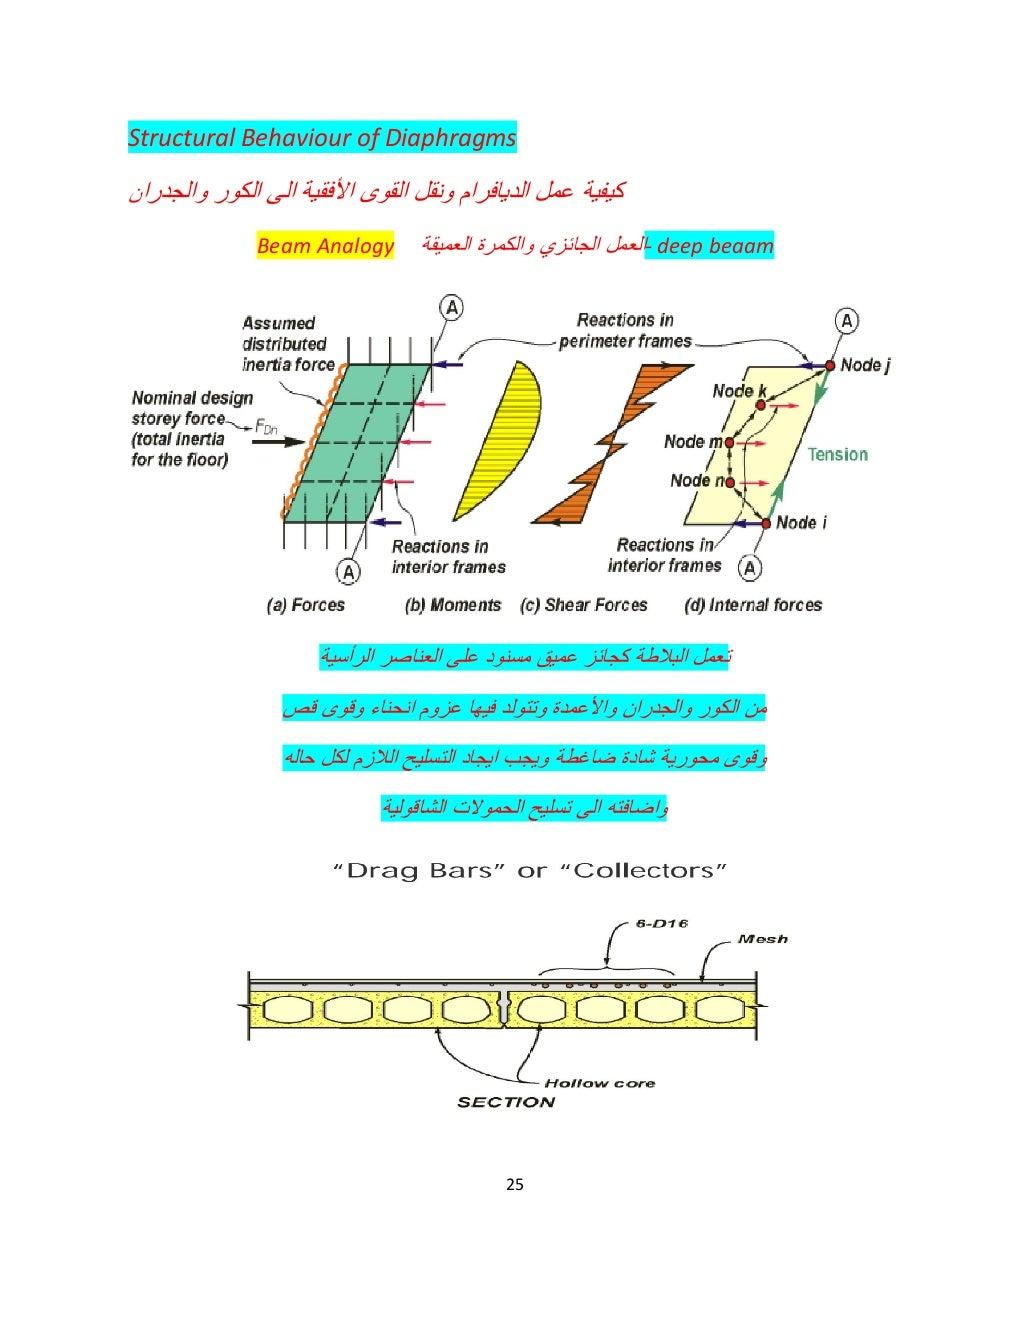 rigid-semi-rigid-flexible-diaphragm-for-seismic-analysis-25-1024.jpg